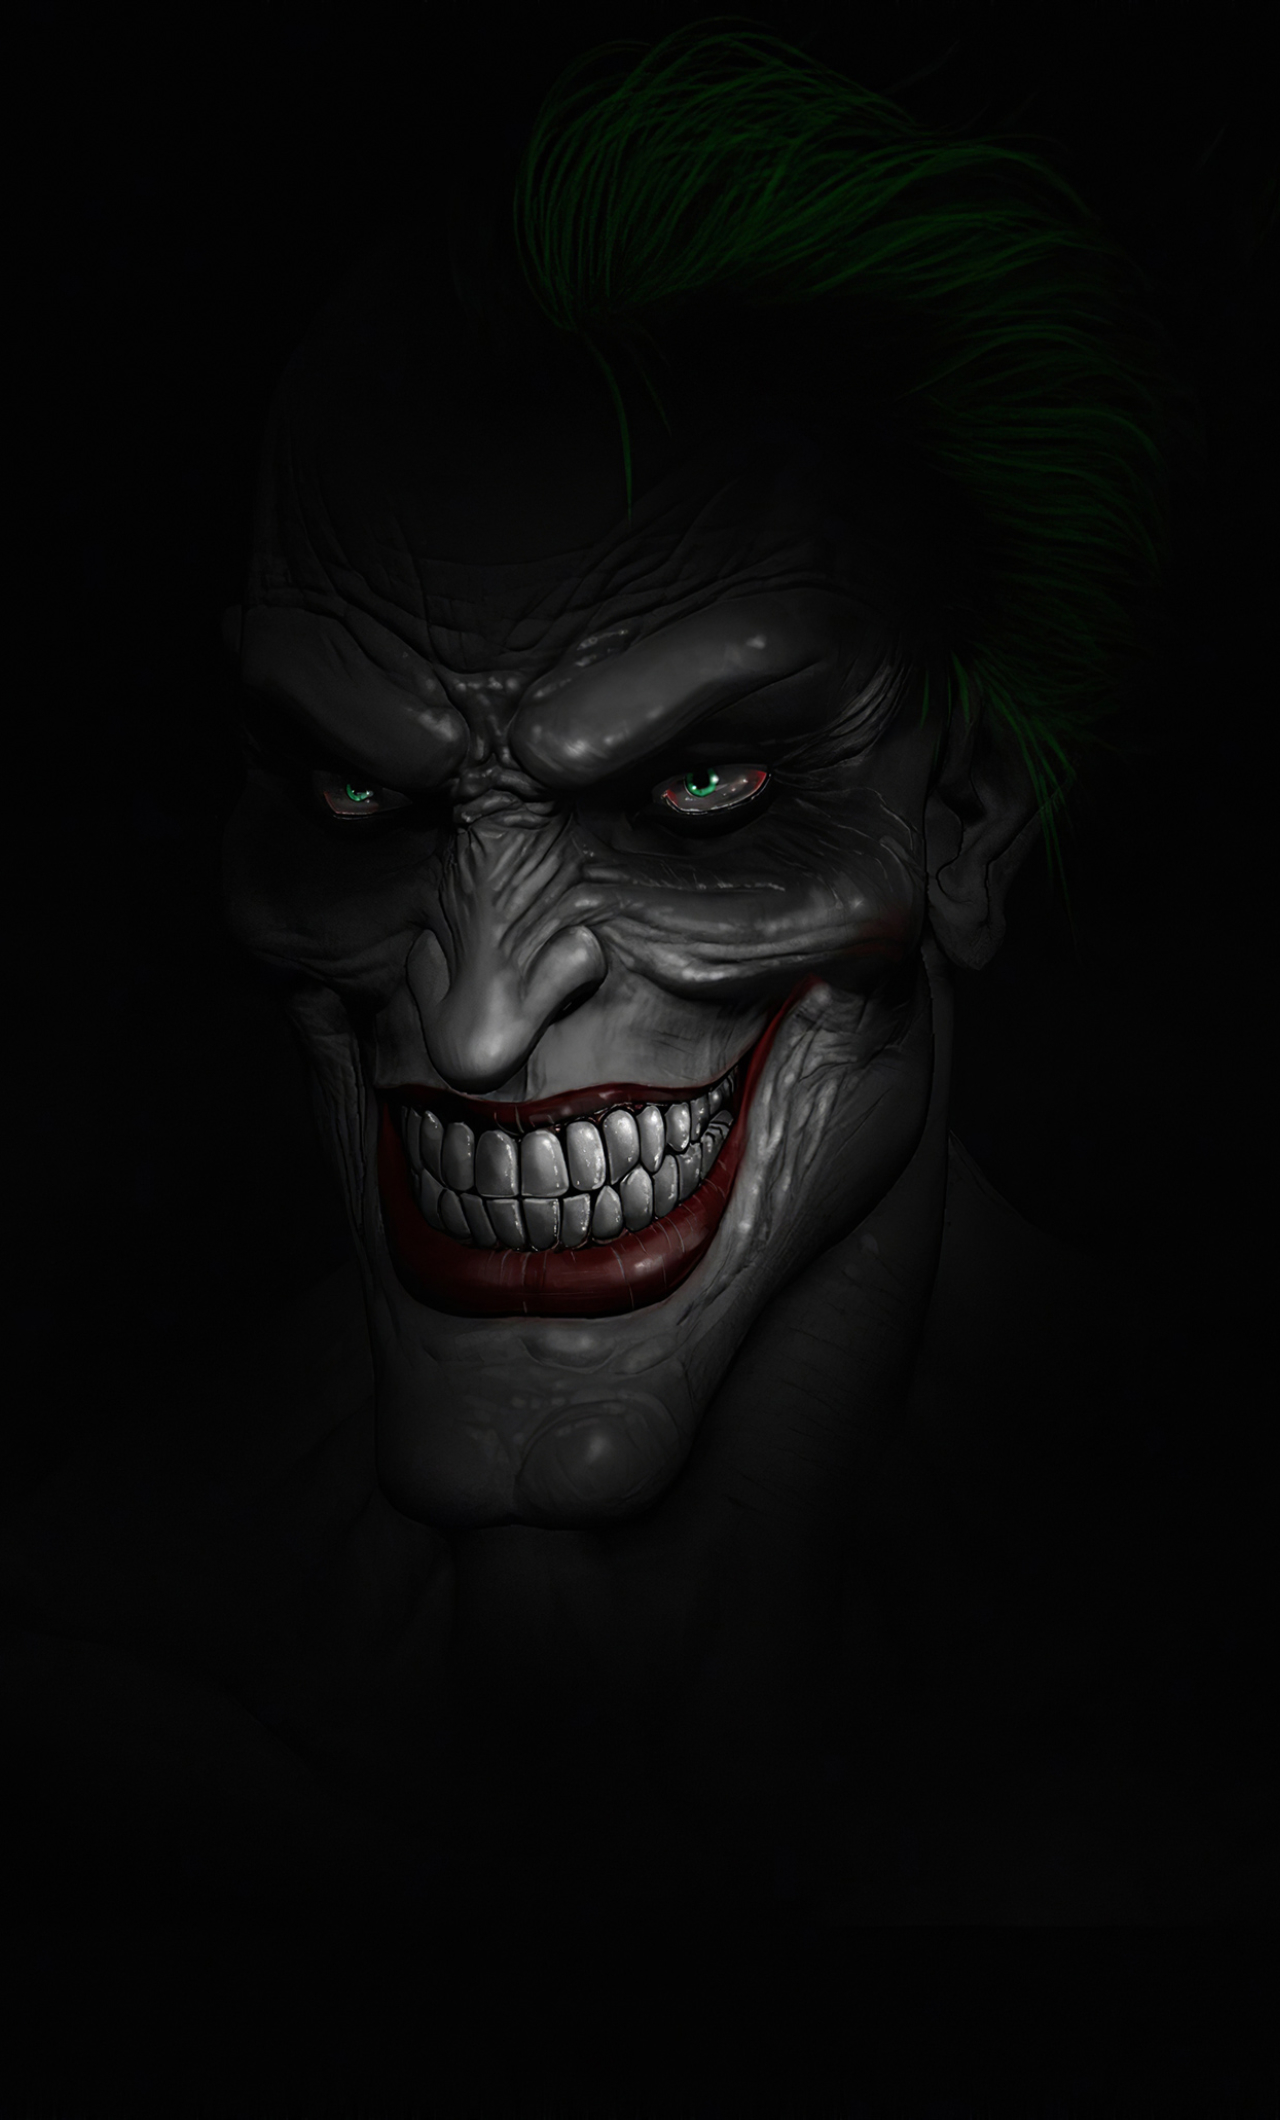 1280x2120 Scary Joker Minimal 4K iPhone 6 plus Wallpaper ...